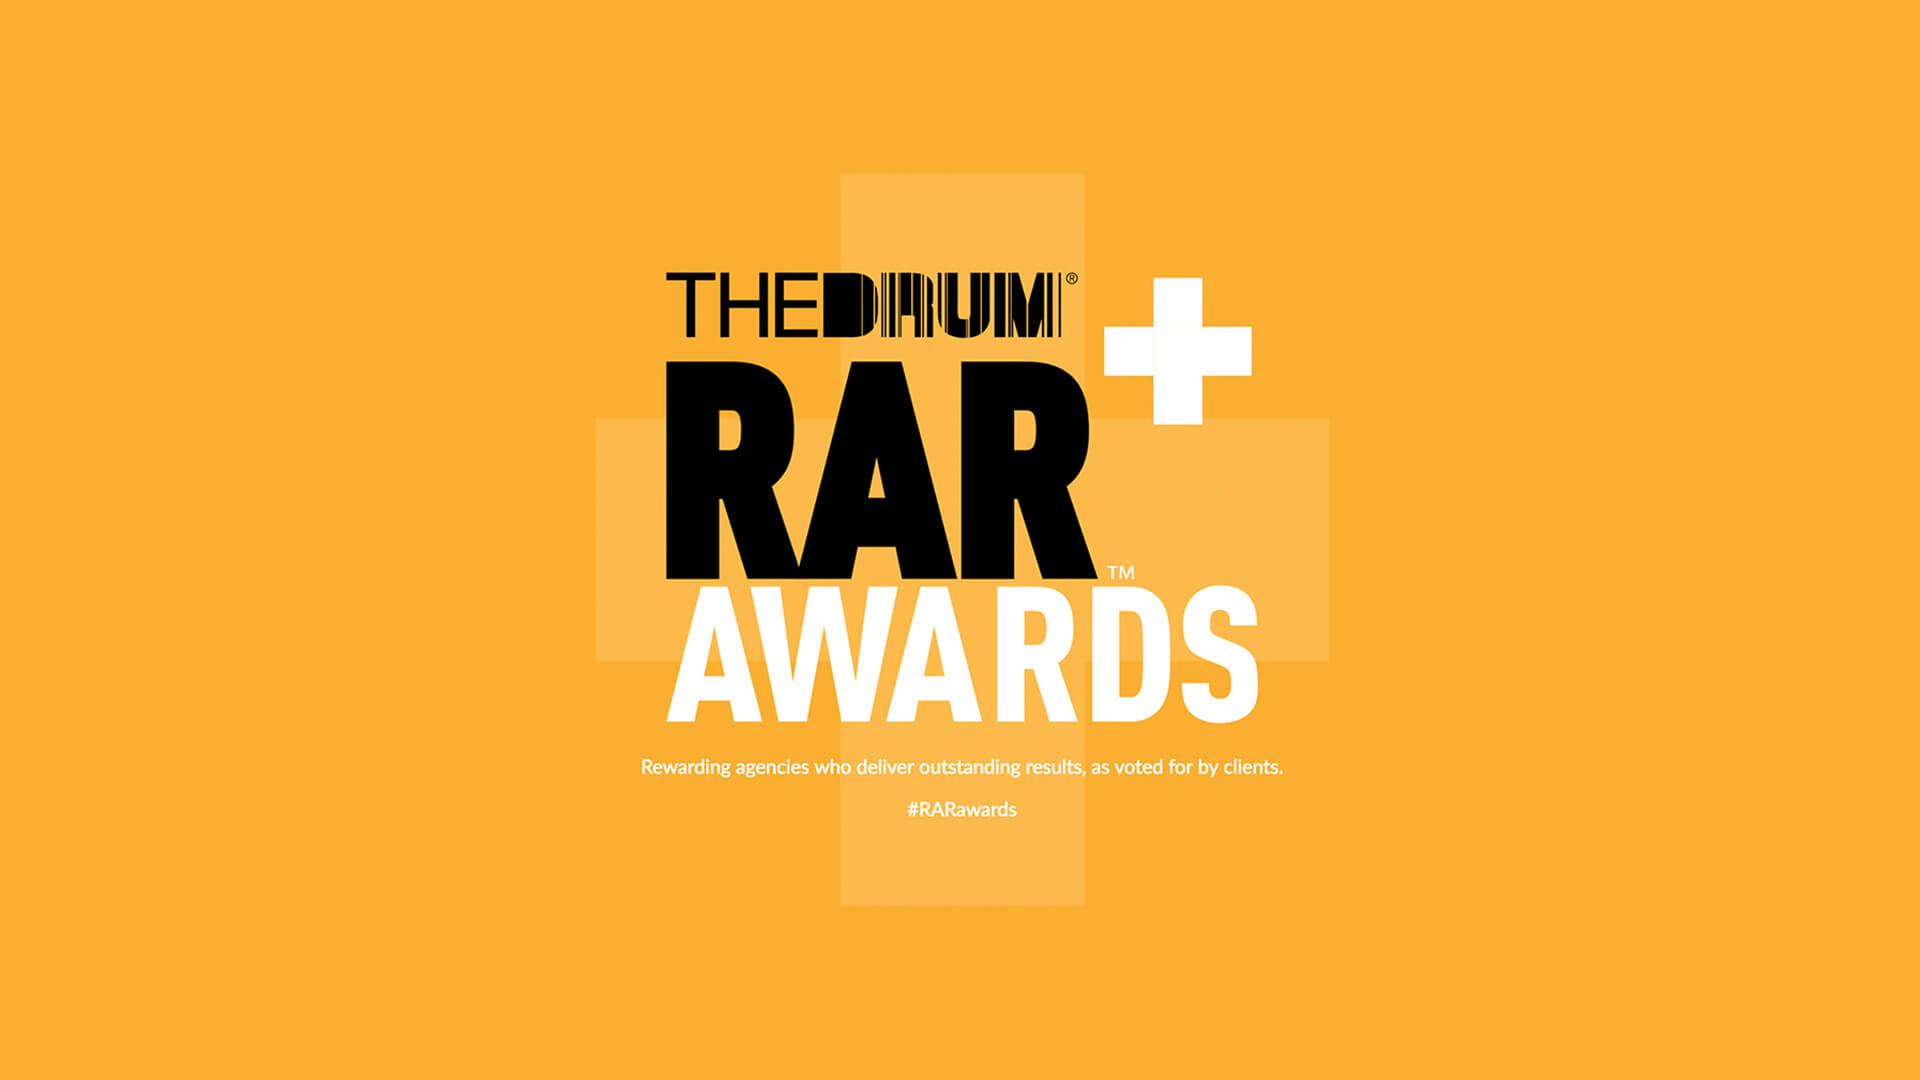 The Drum RAR Awards | We Are 778